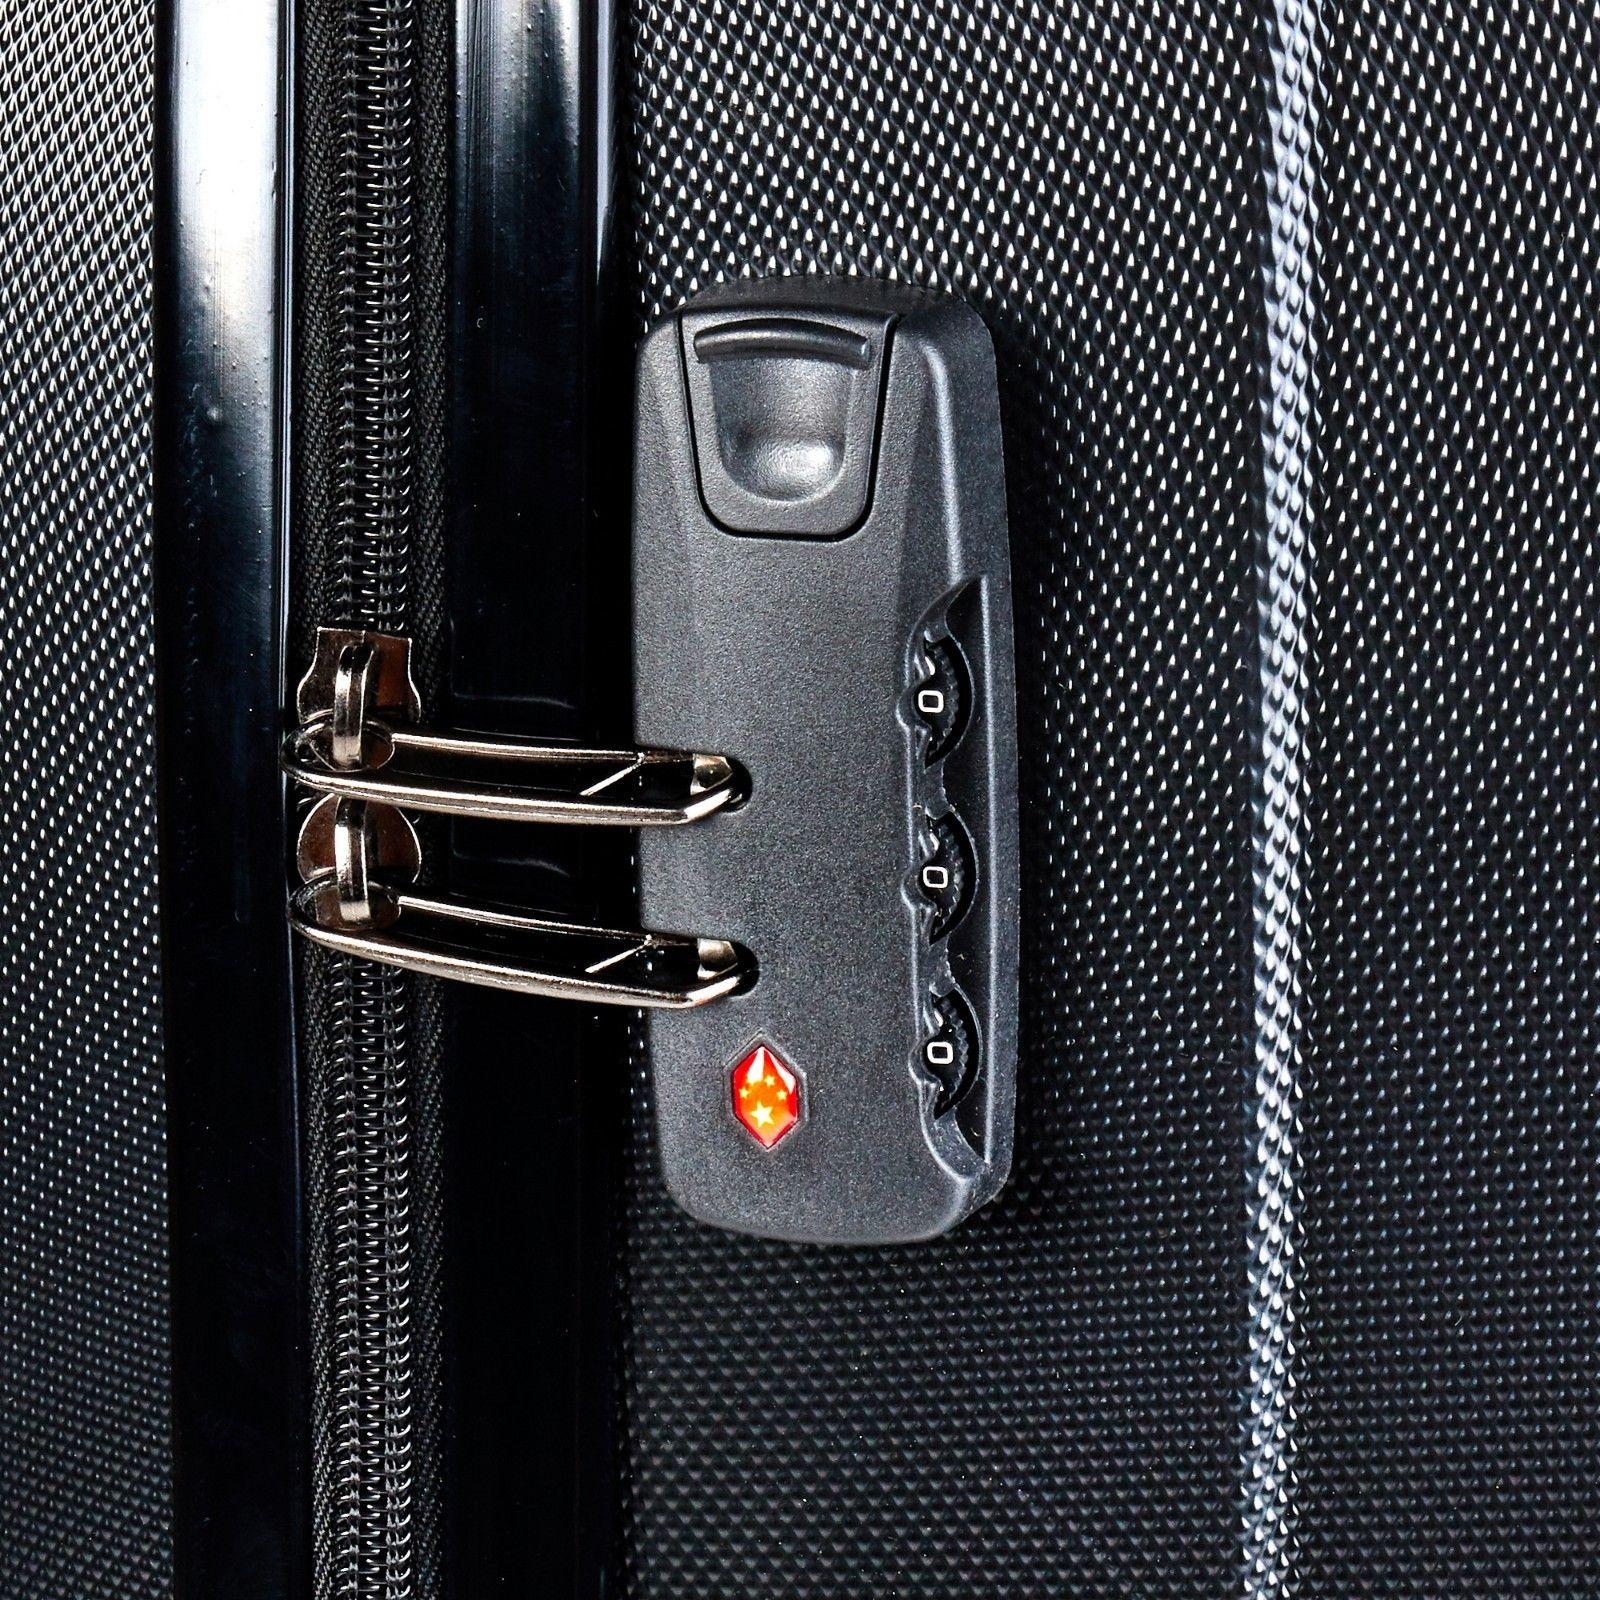 Milano-Premium-3pc-ABS-Luggage-Suitcase-Luxury-Hard-Case-Shockproof-Travel-Set thumbnail 13